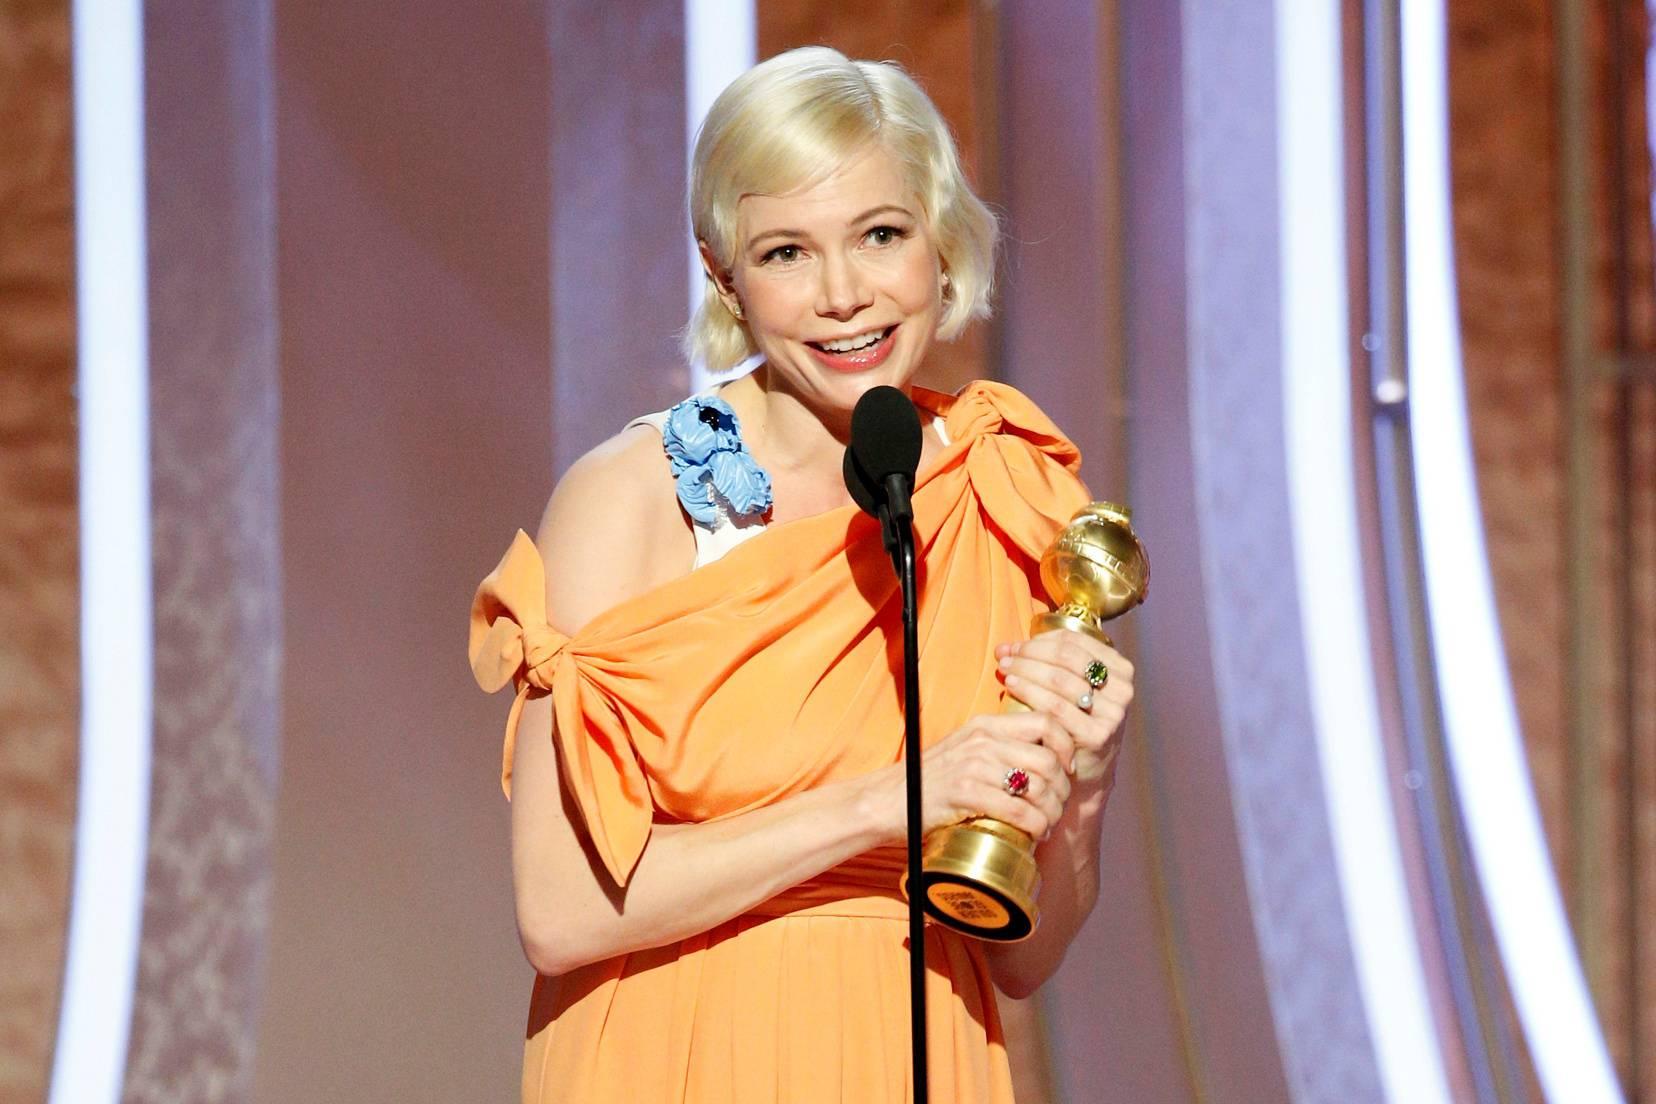 77th Golden Globe Awards - Show - Beverly Hills, California, U.S.